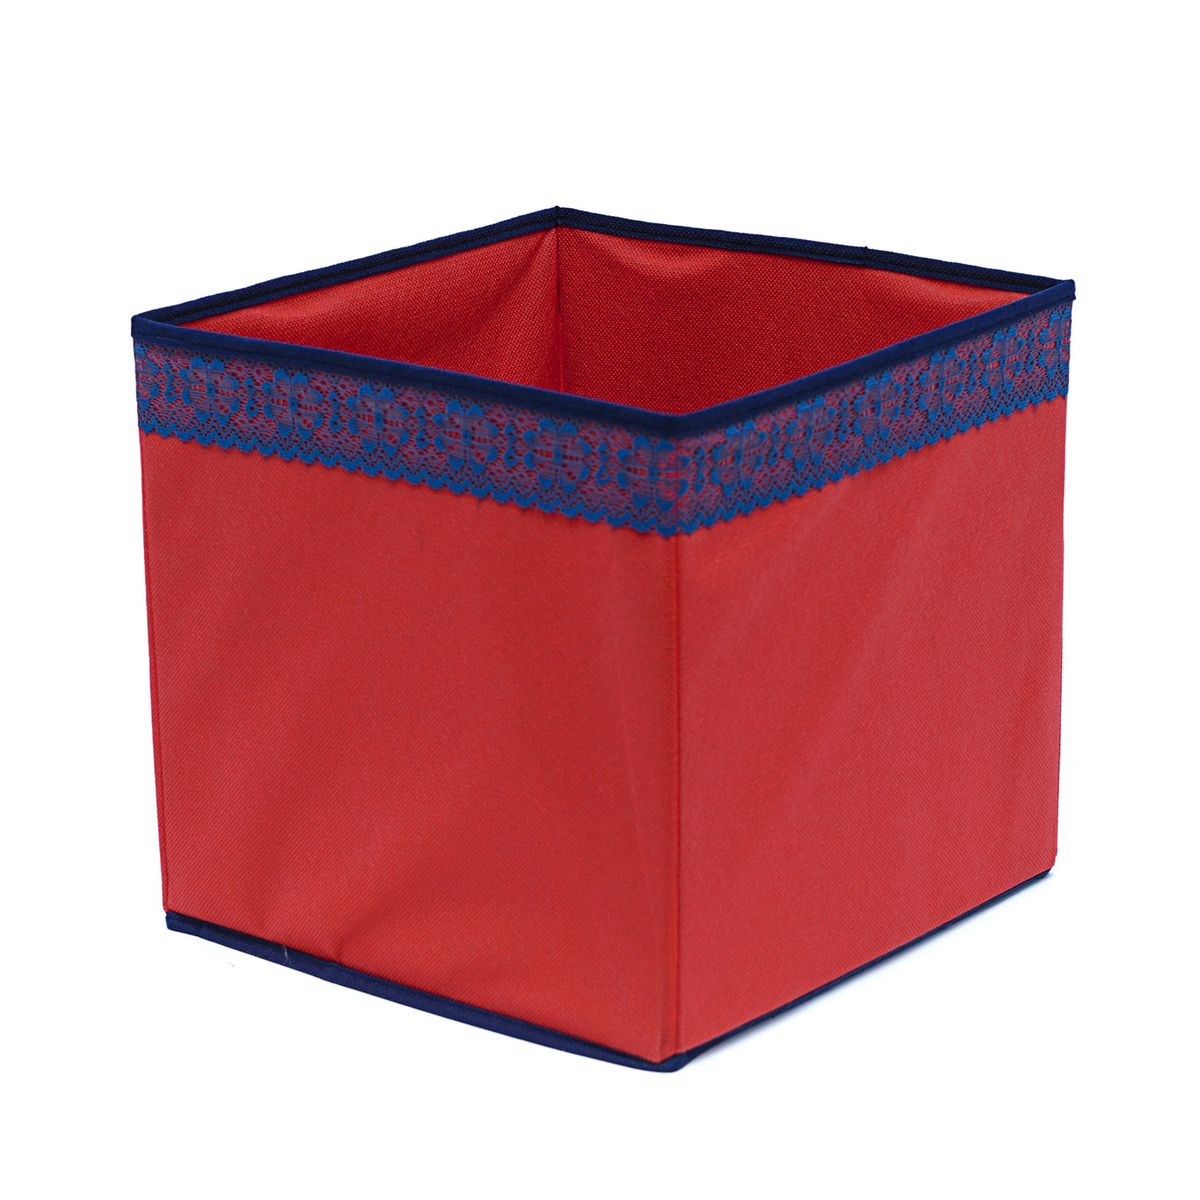 Кофр для хранения Homsu Rosso, 27 х 27 х 27 см